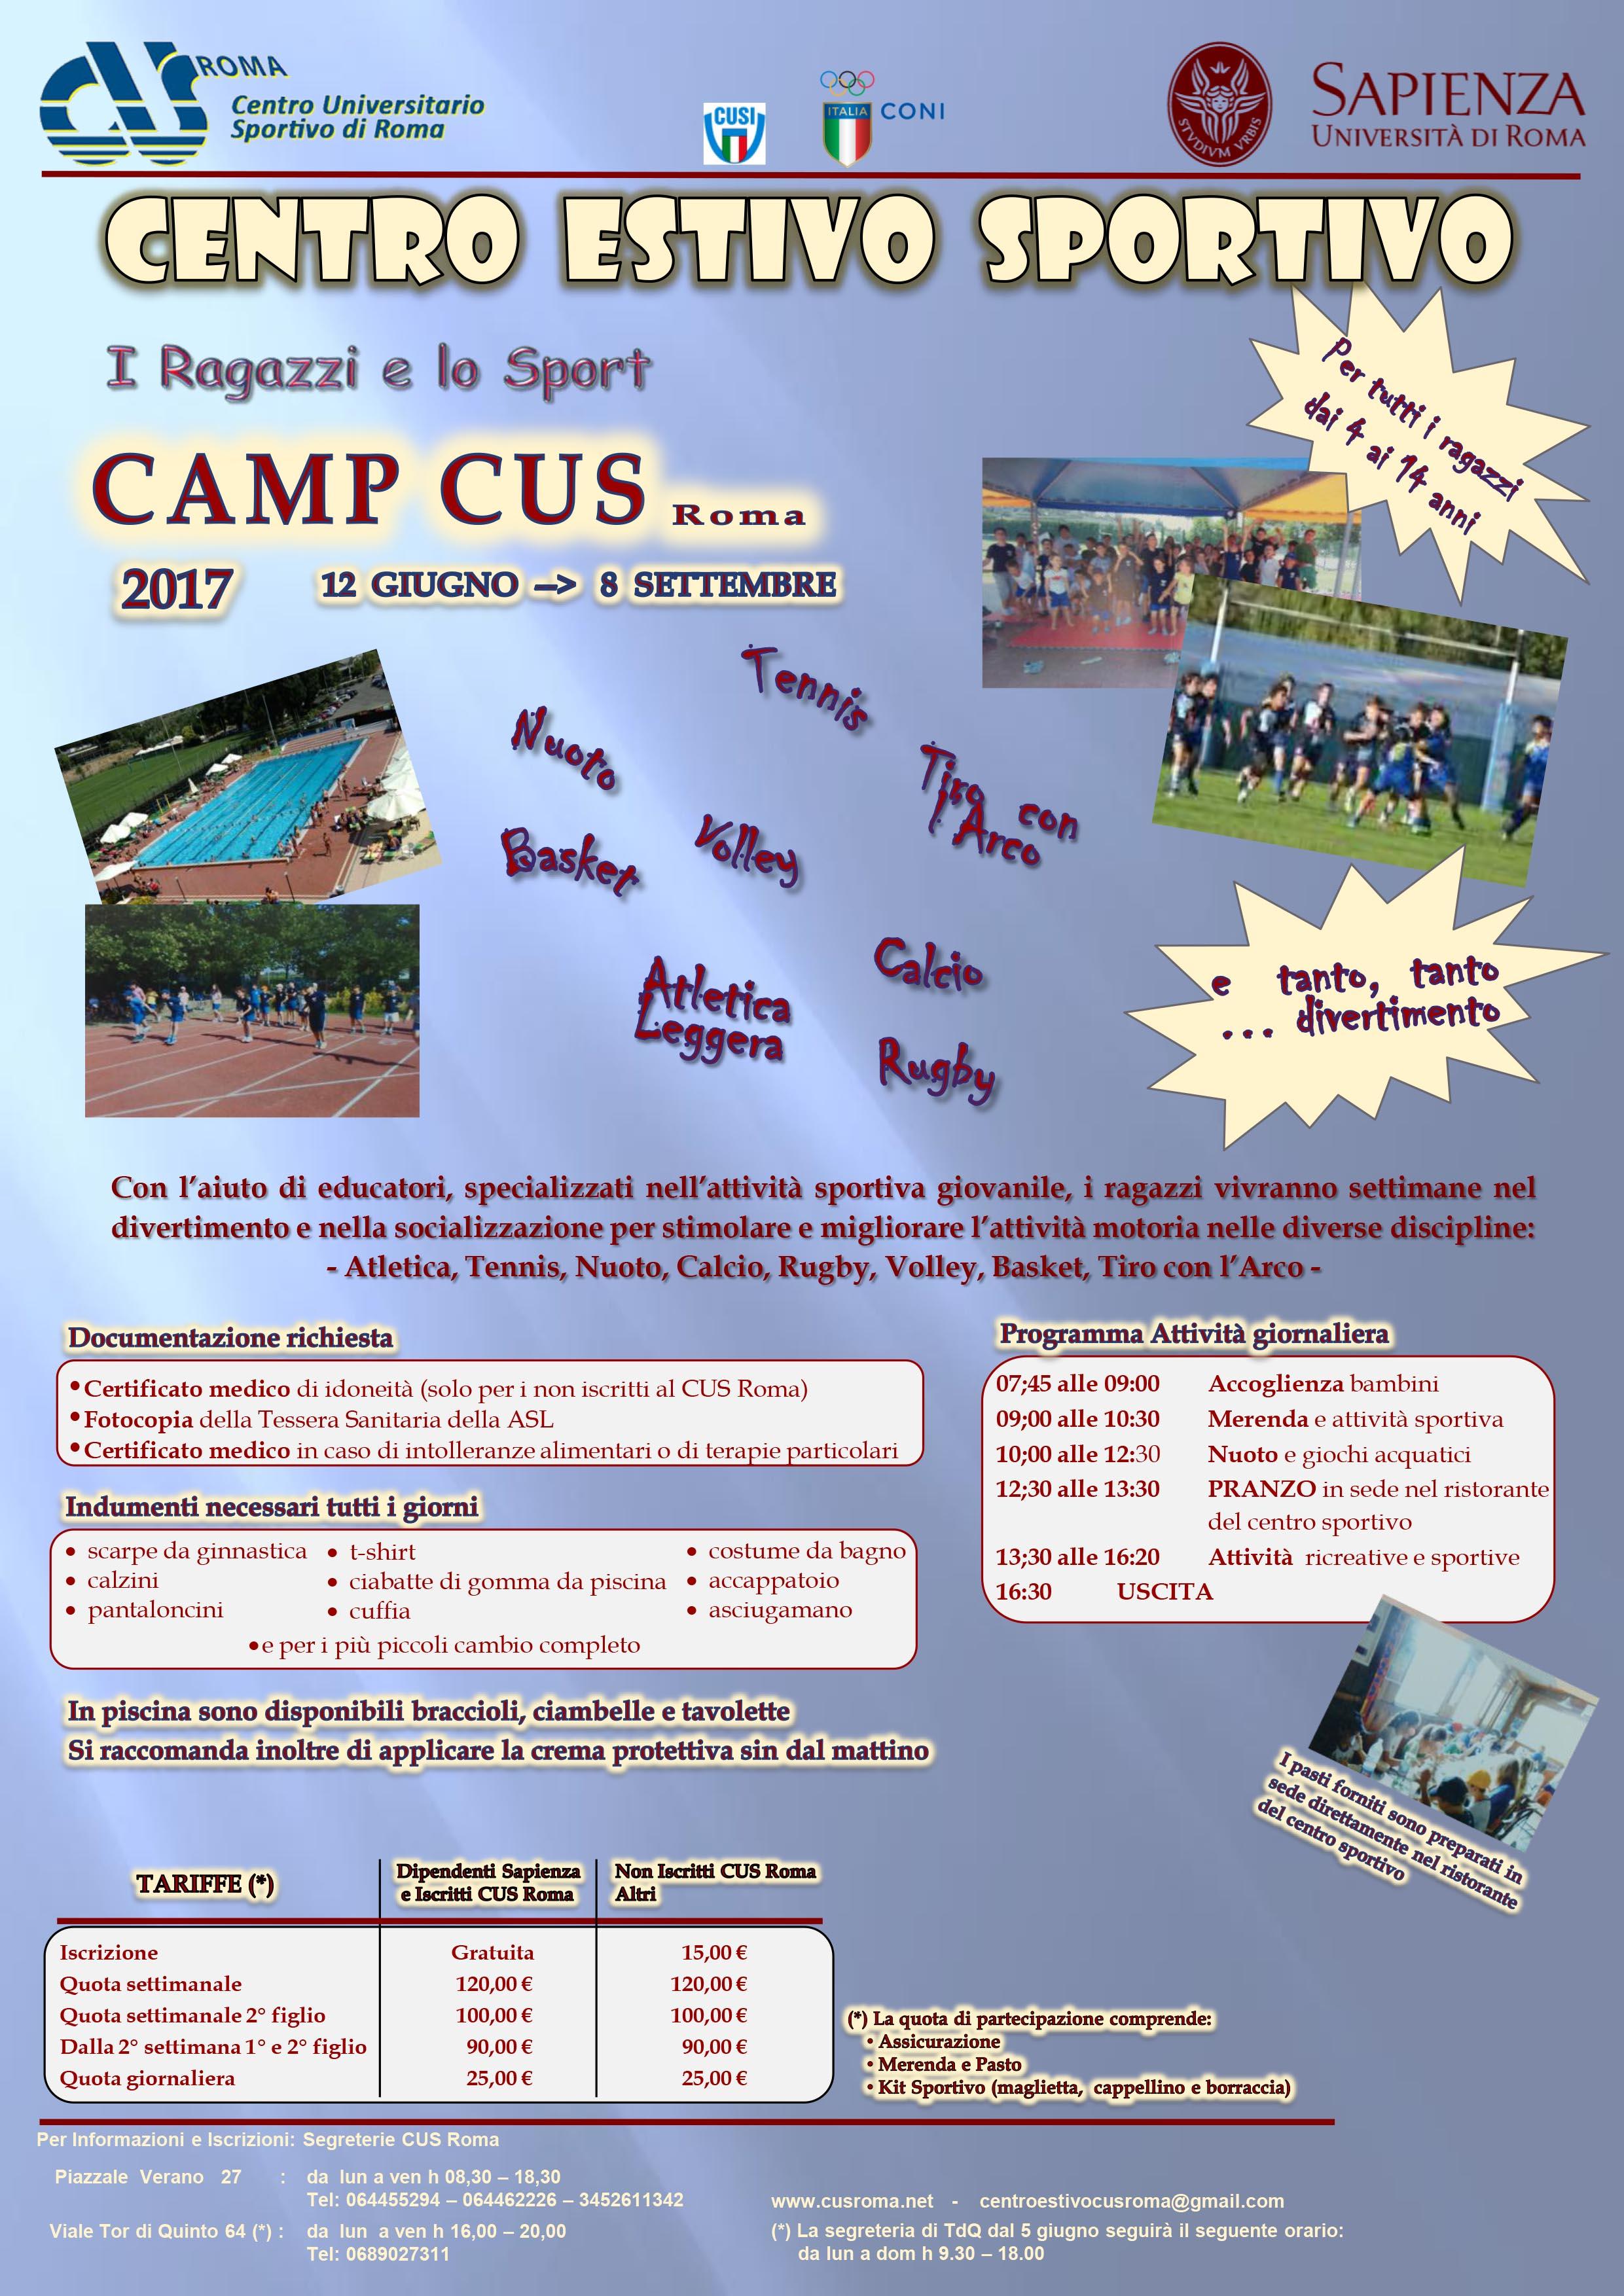 Centro Estivo CAMPCUS 2017